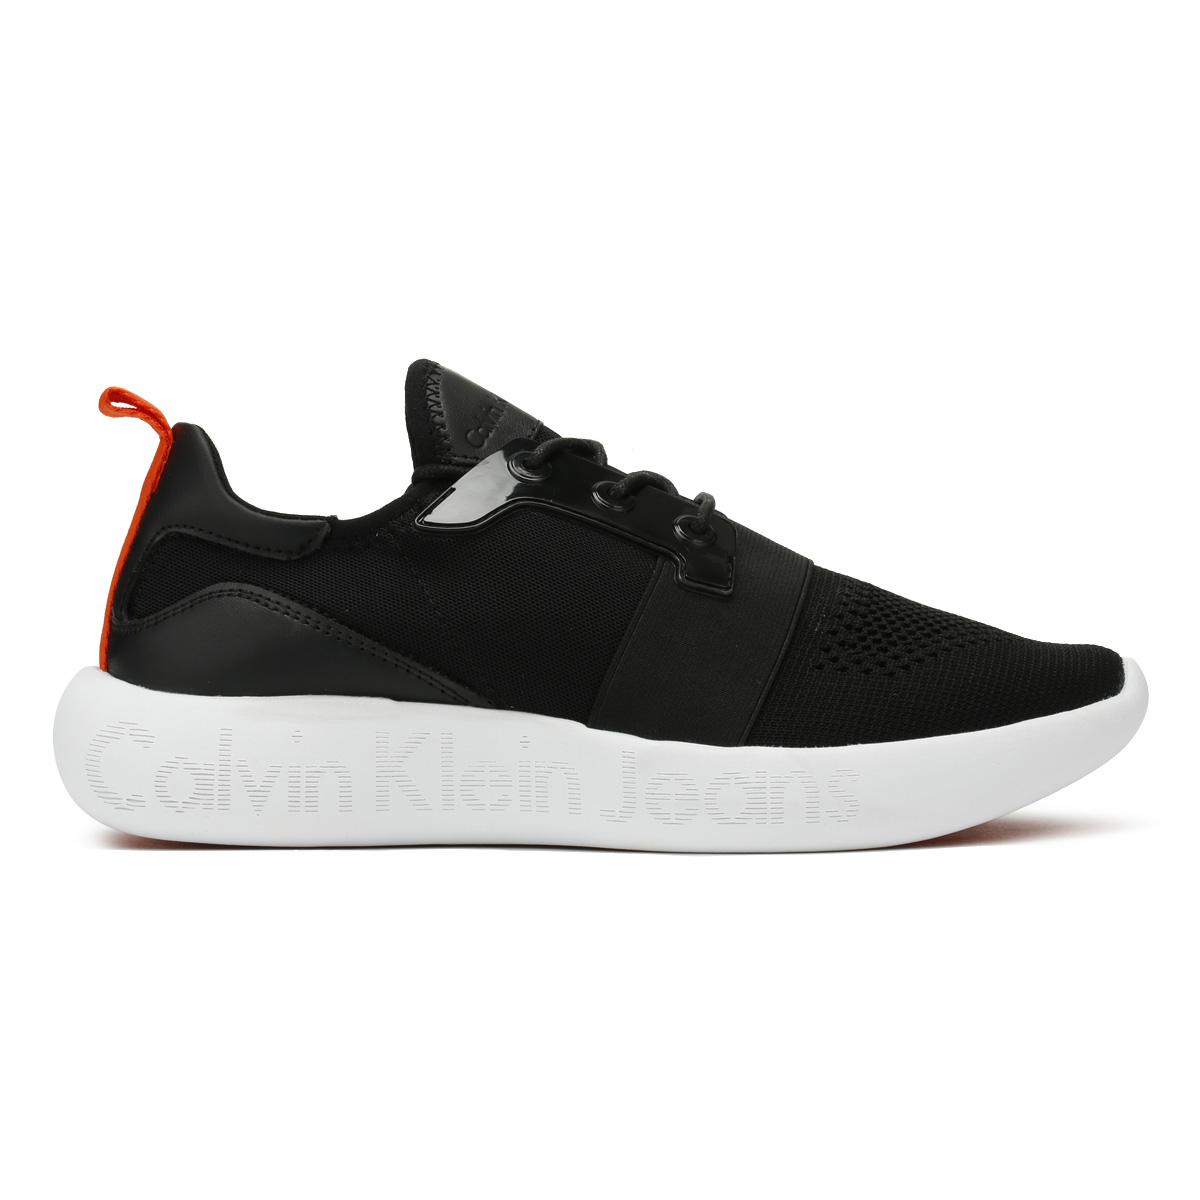 0d729174c9d6a5 ... Nike Air Jordan 5 V Retro 3Lab5 Black Metallic Silver Silver Silver  599581 003 Size 11 ...